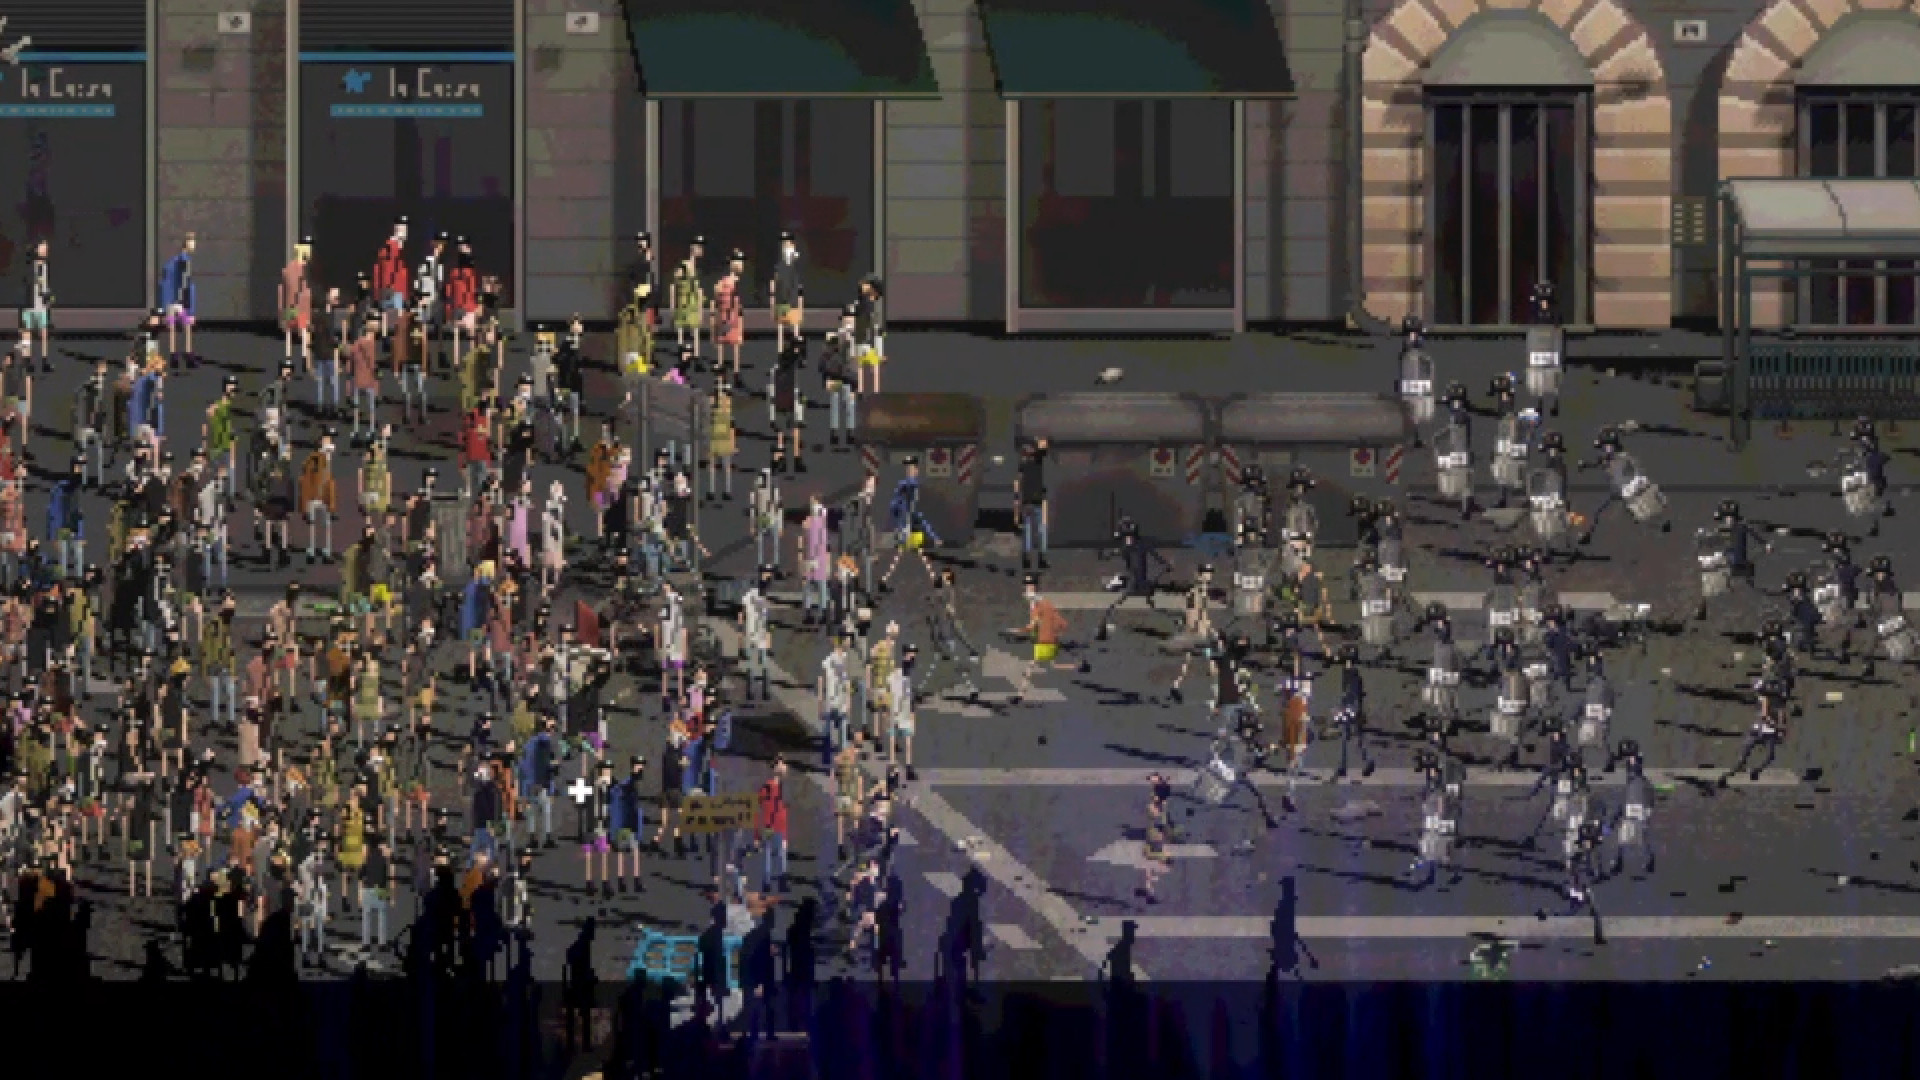 Official RIOT - Civil Unrest Wiki